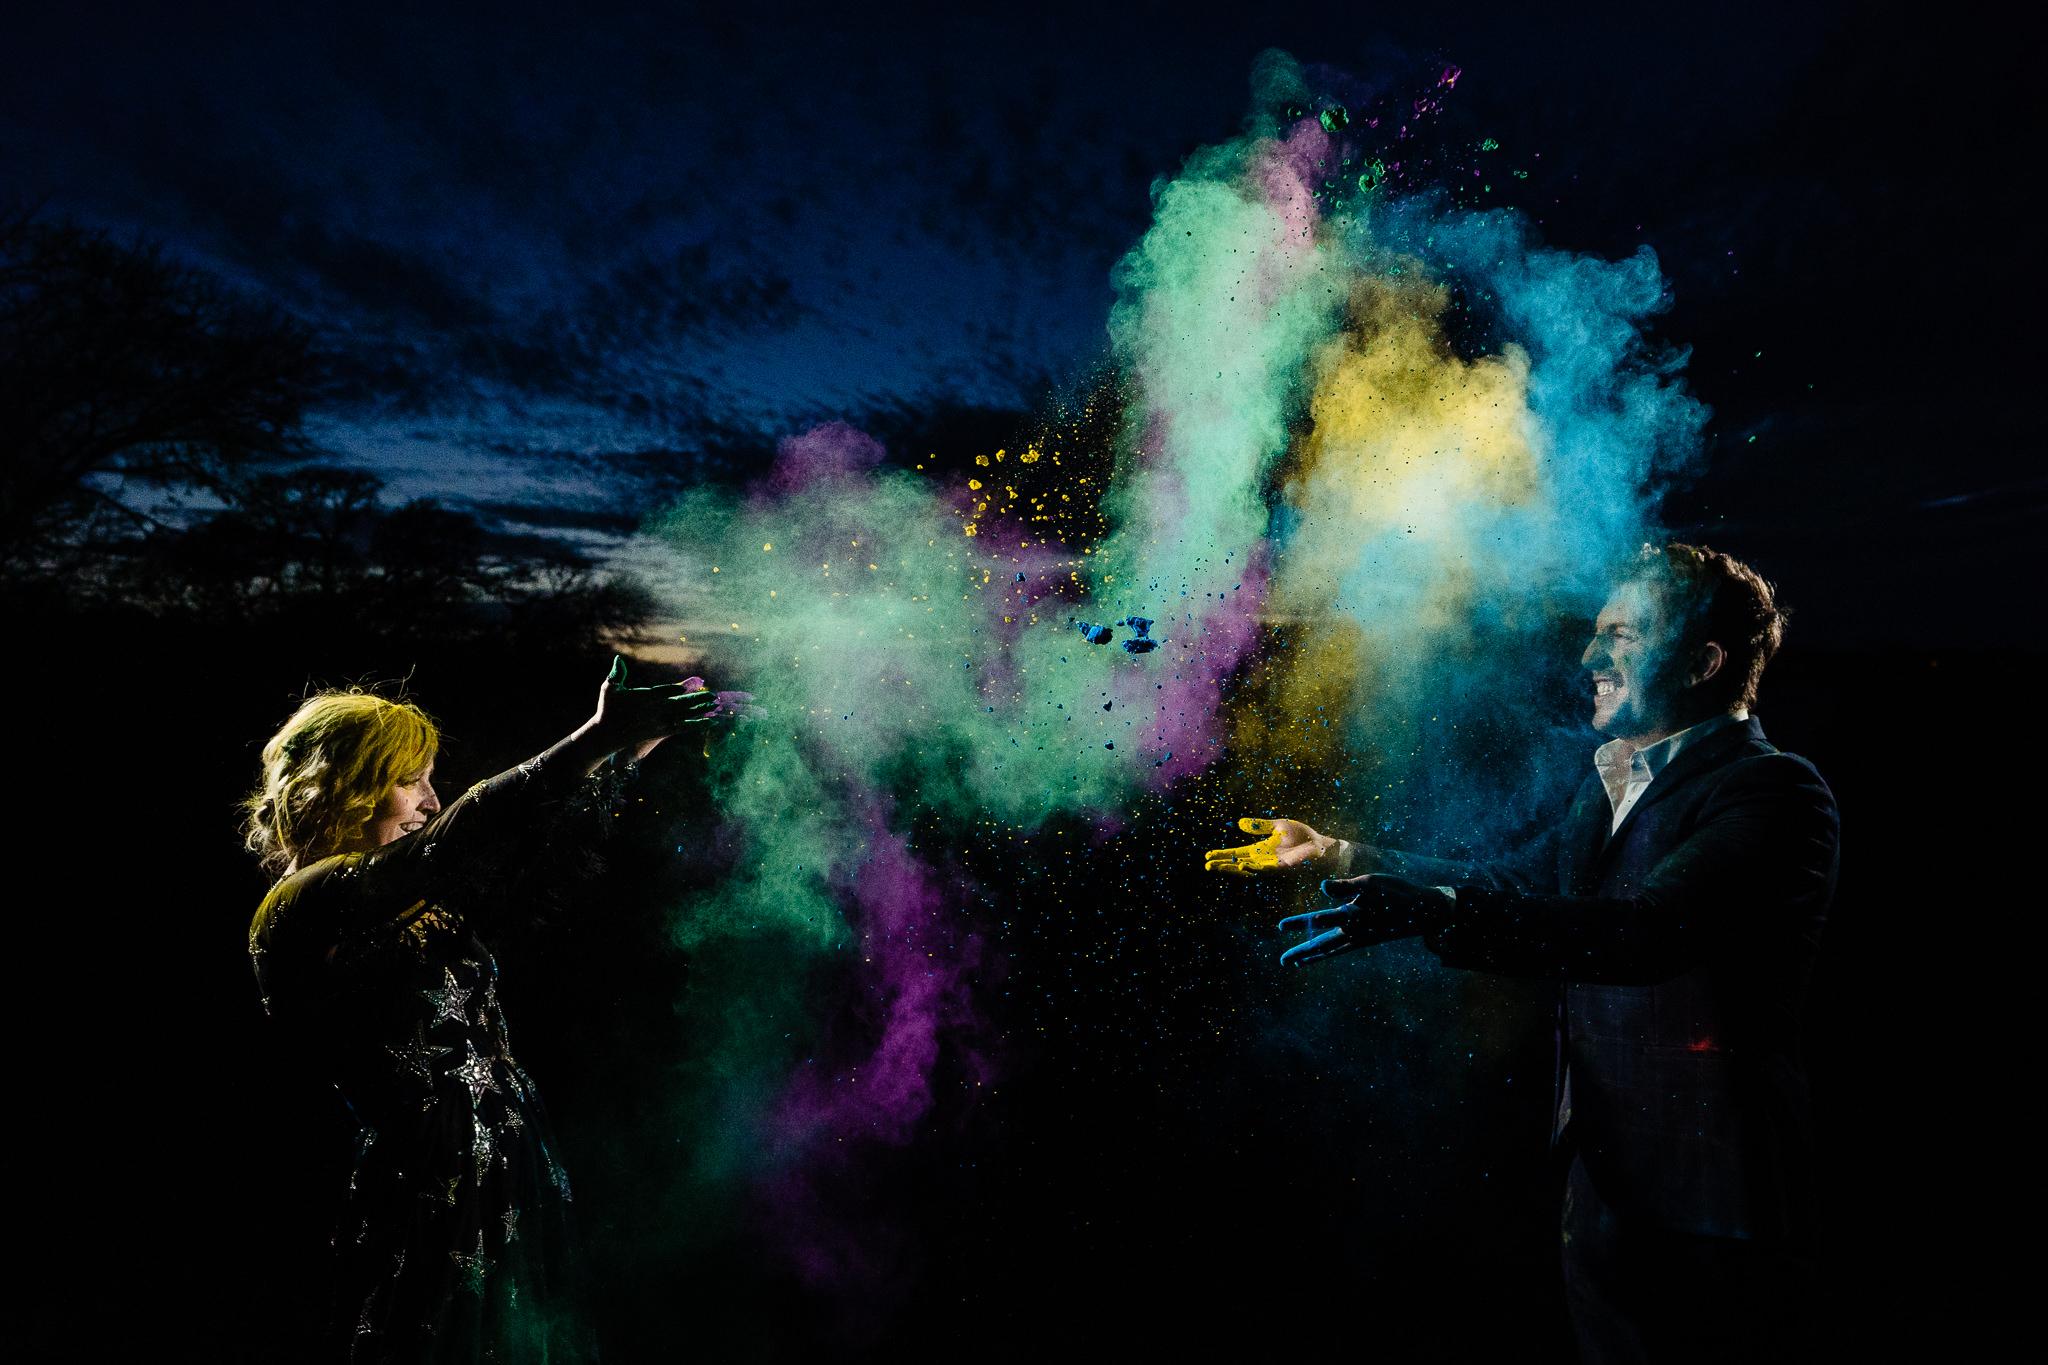 best austin wedding photographer john winters photography holi powder engagement session night photographer